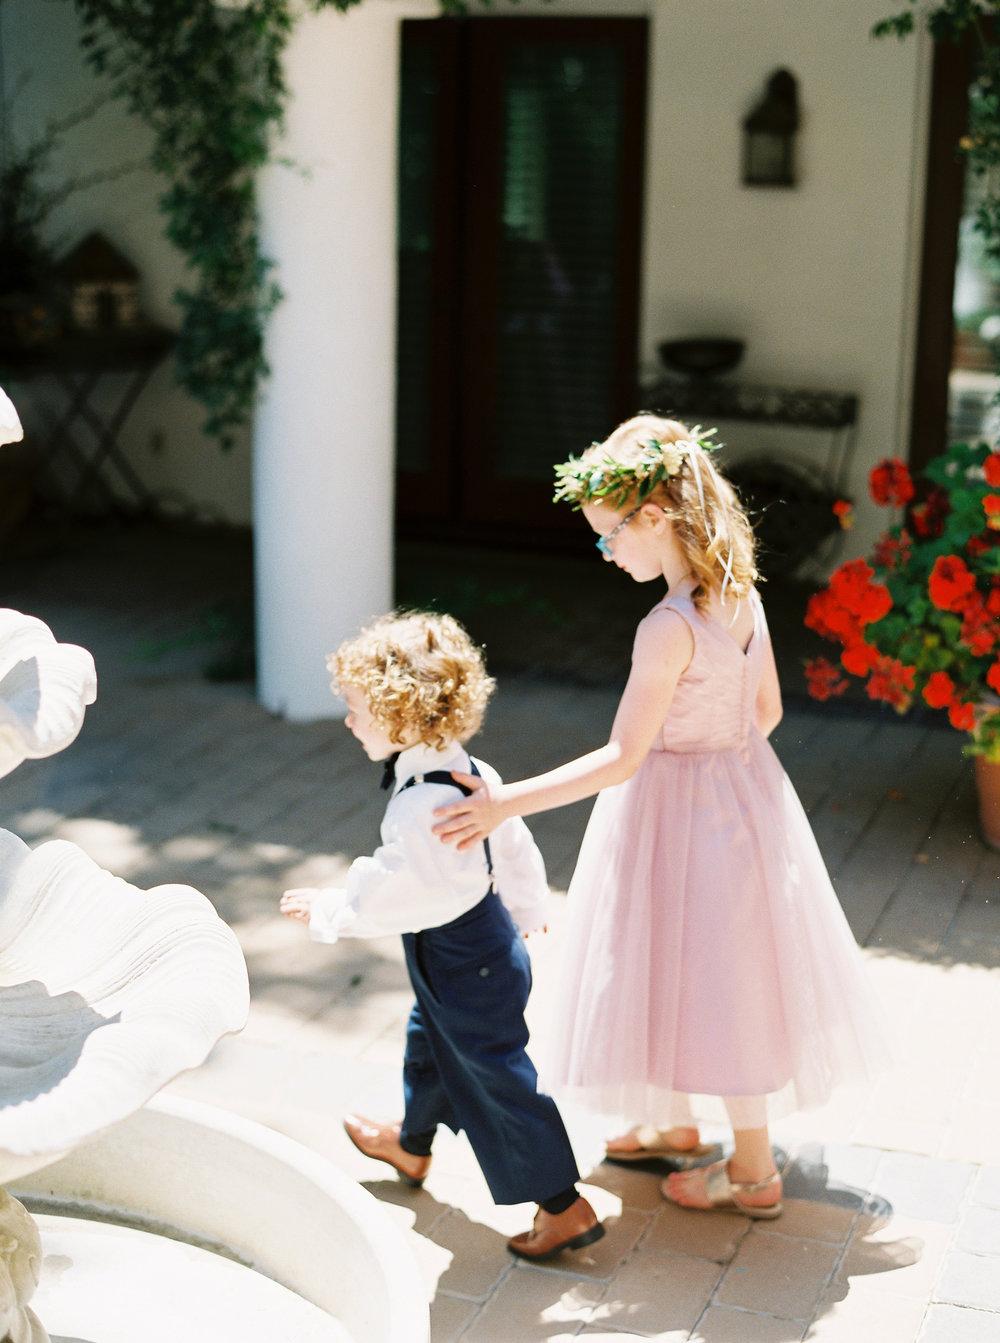 Durst-winery-wedding-in-lodi-calfornia-91.jpg